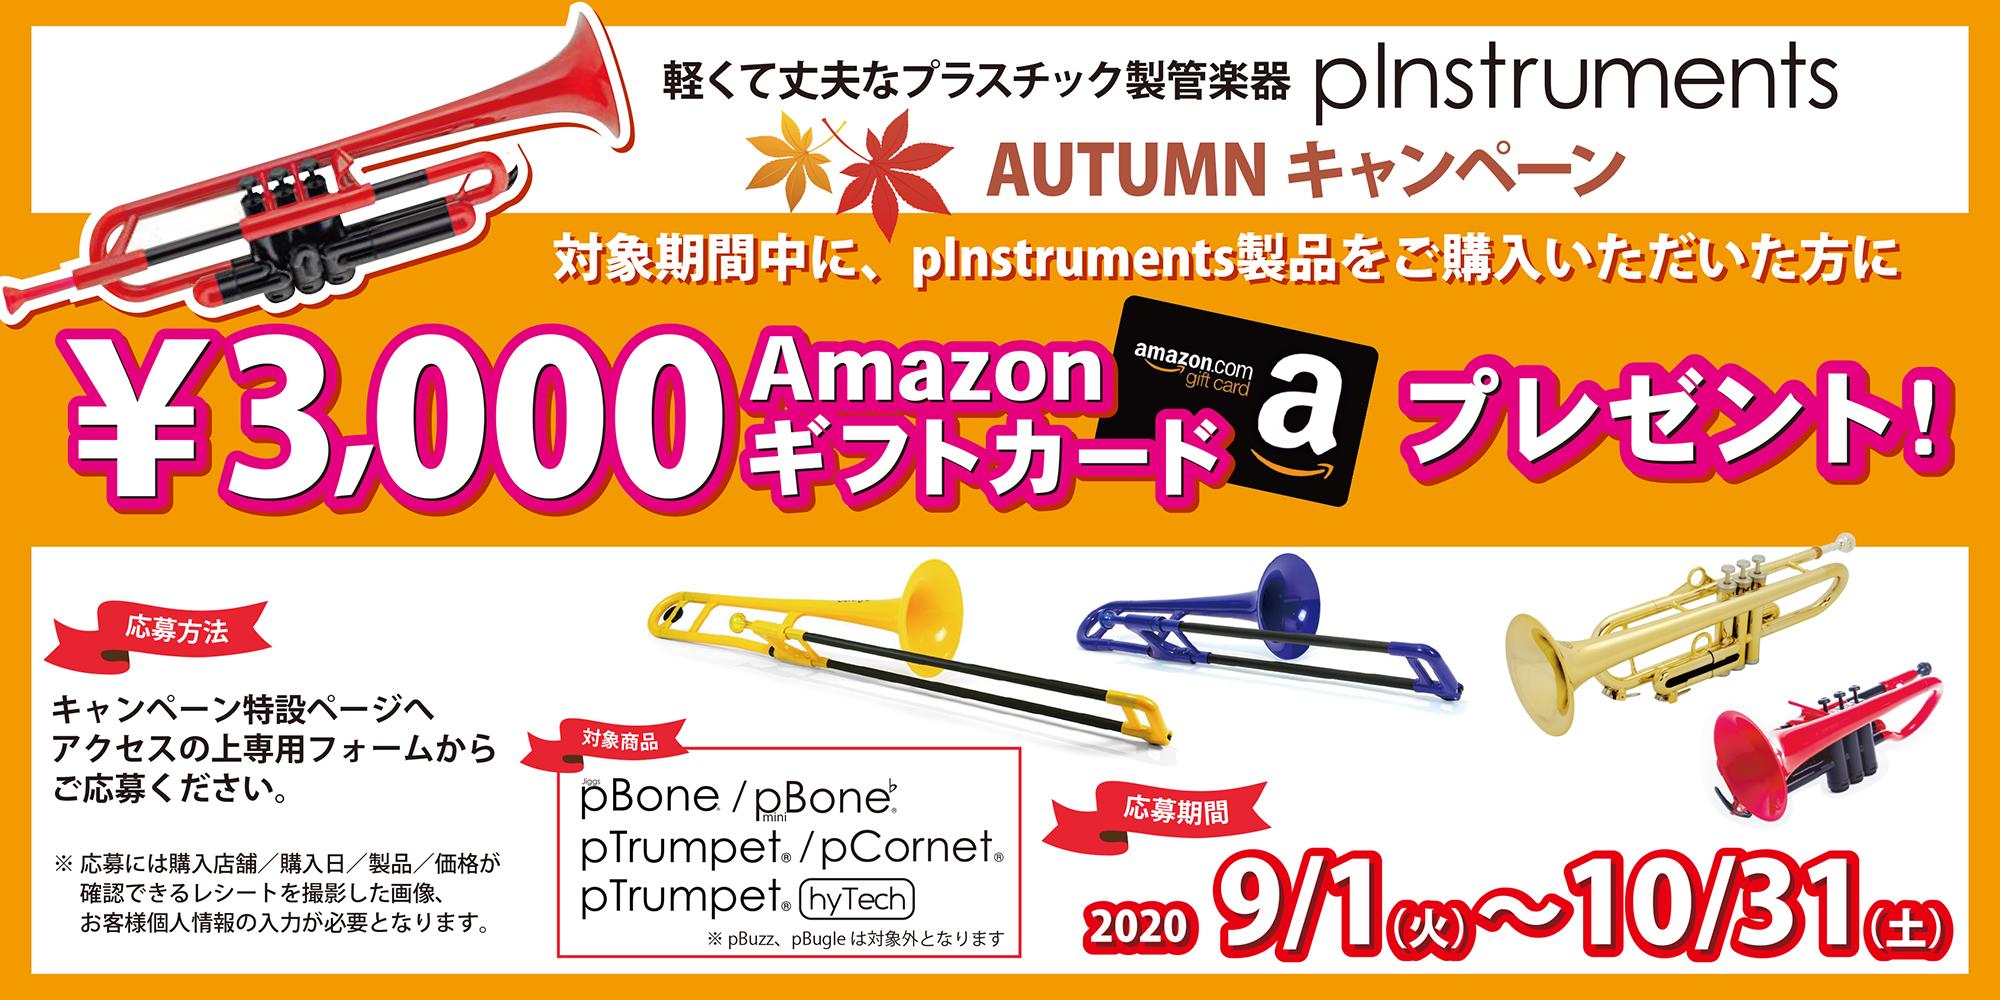 pInstruments 秋キャンペーン!!